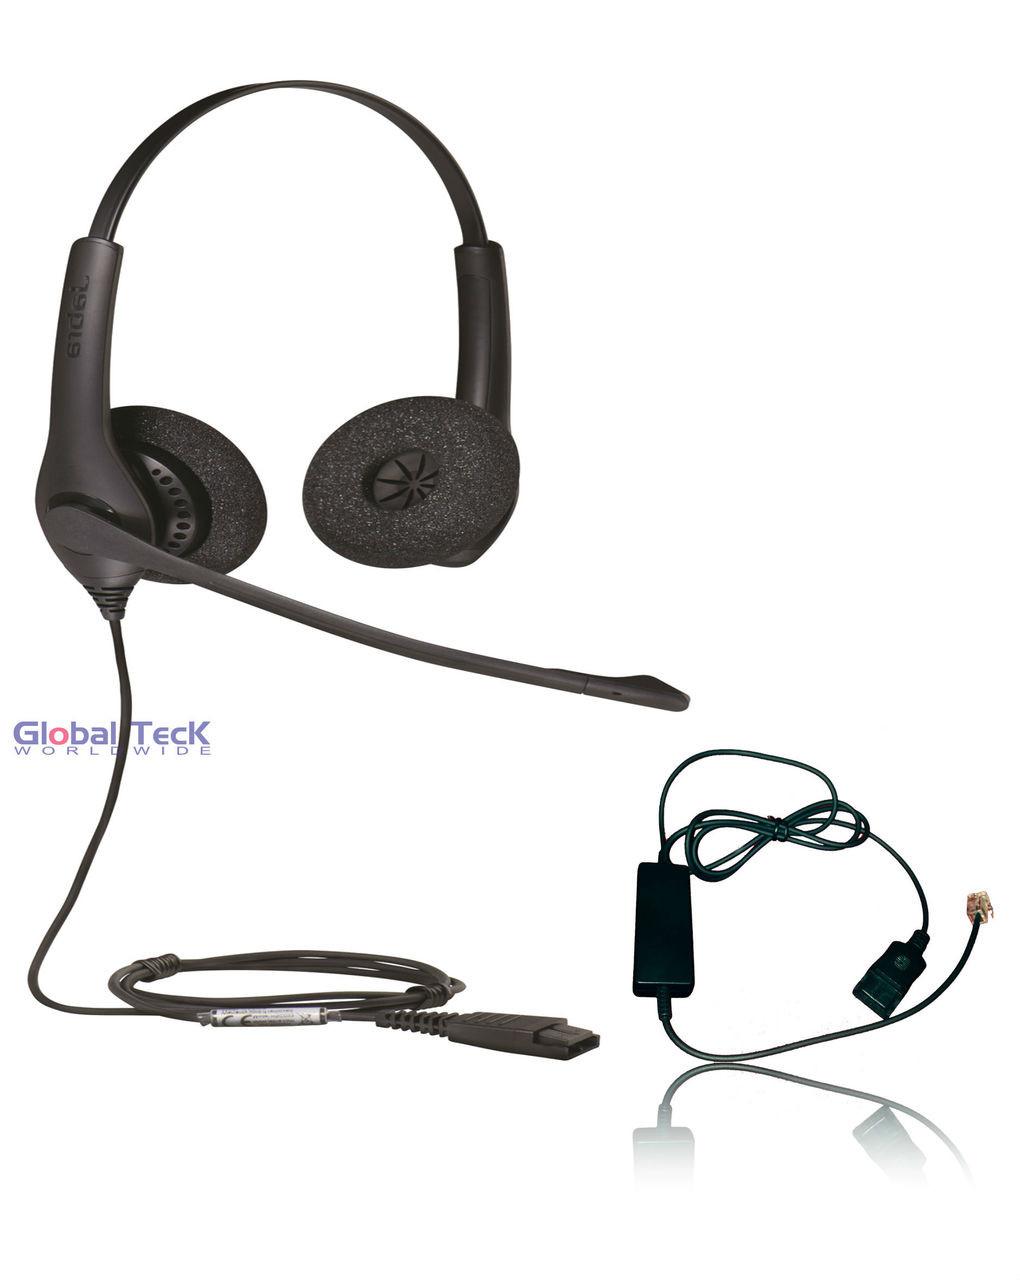 Aastra Compatible Jabra Biz 1525 Duo Headset Bundle With Smart Cord Direct Connect For Aastra Phones 6737i 6739i 6753i 6755i 6757i 7446i 9143i